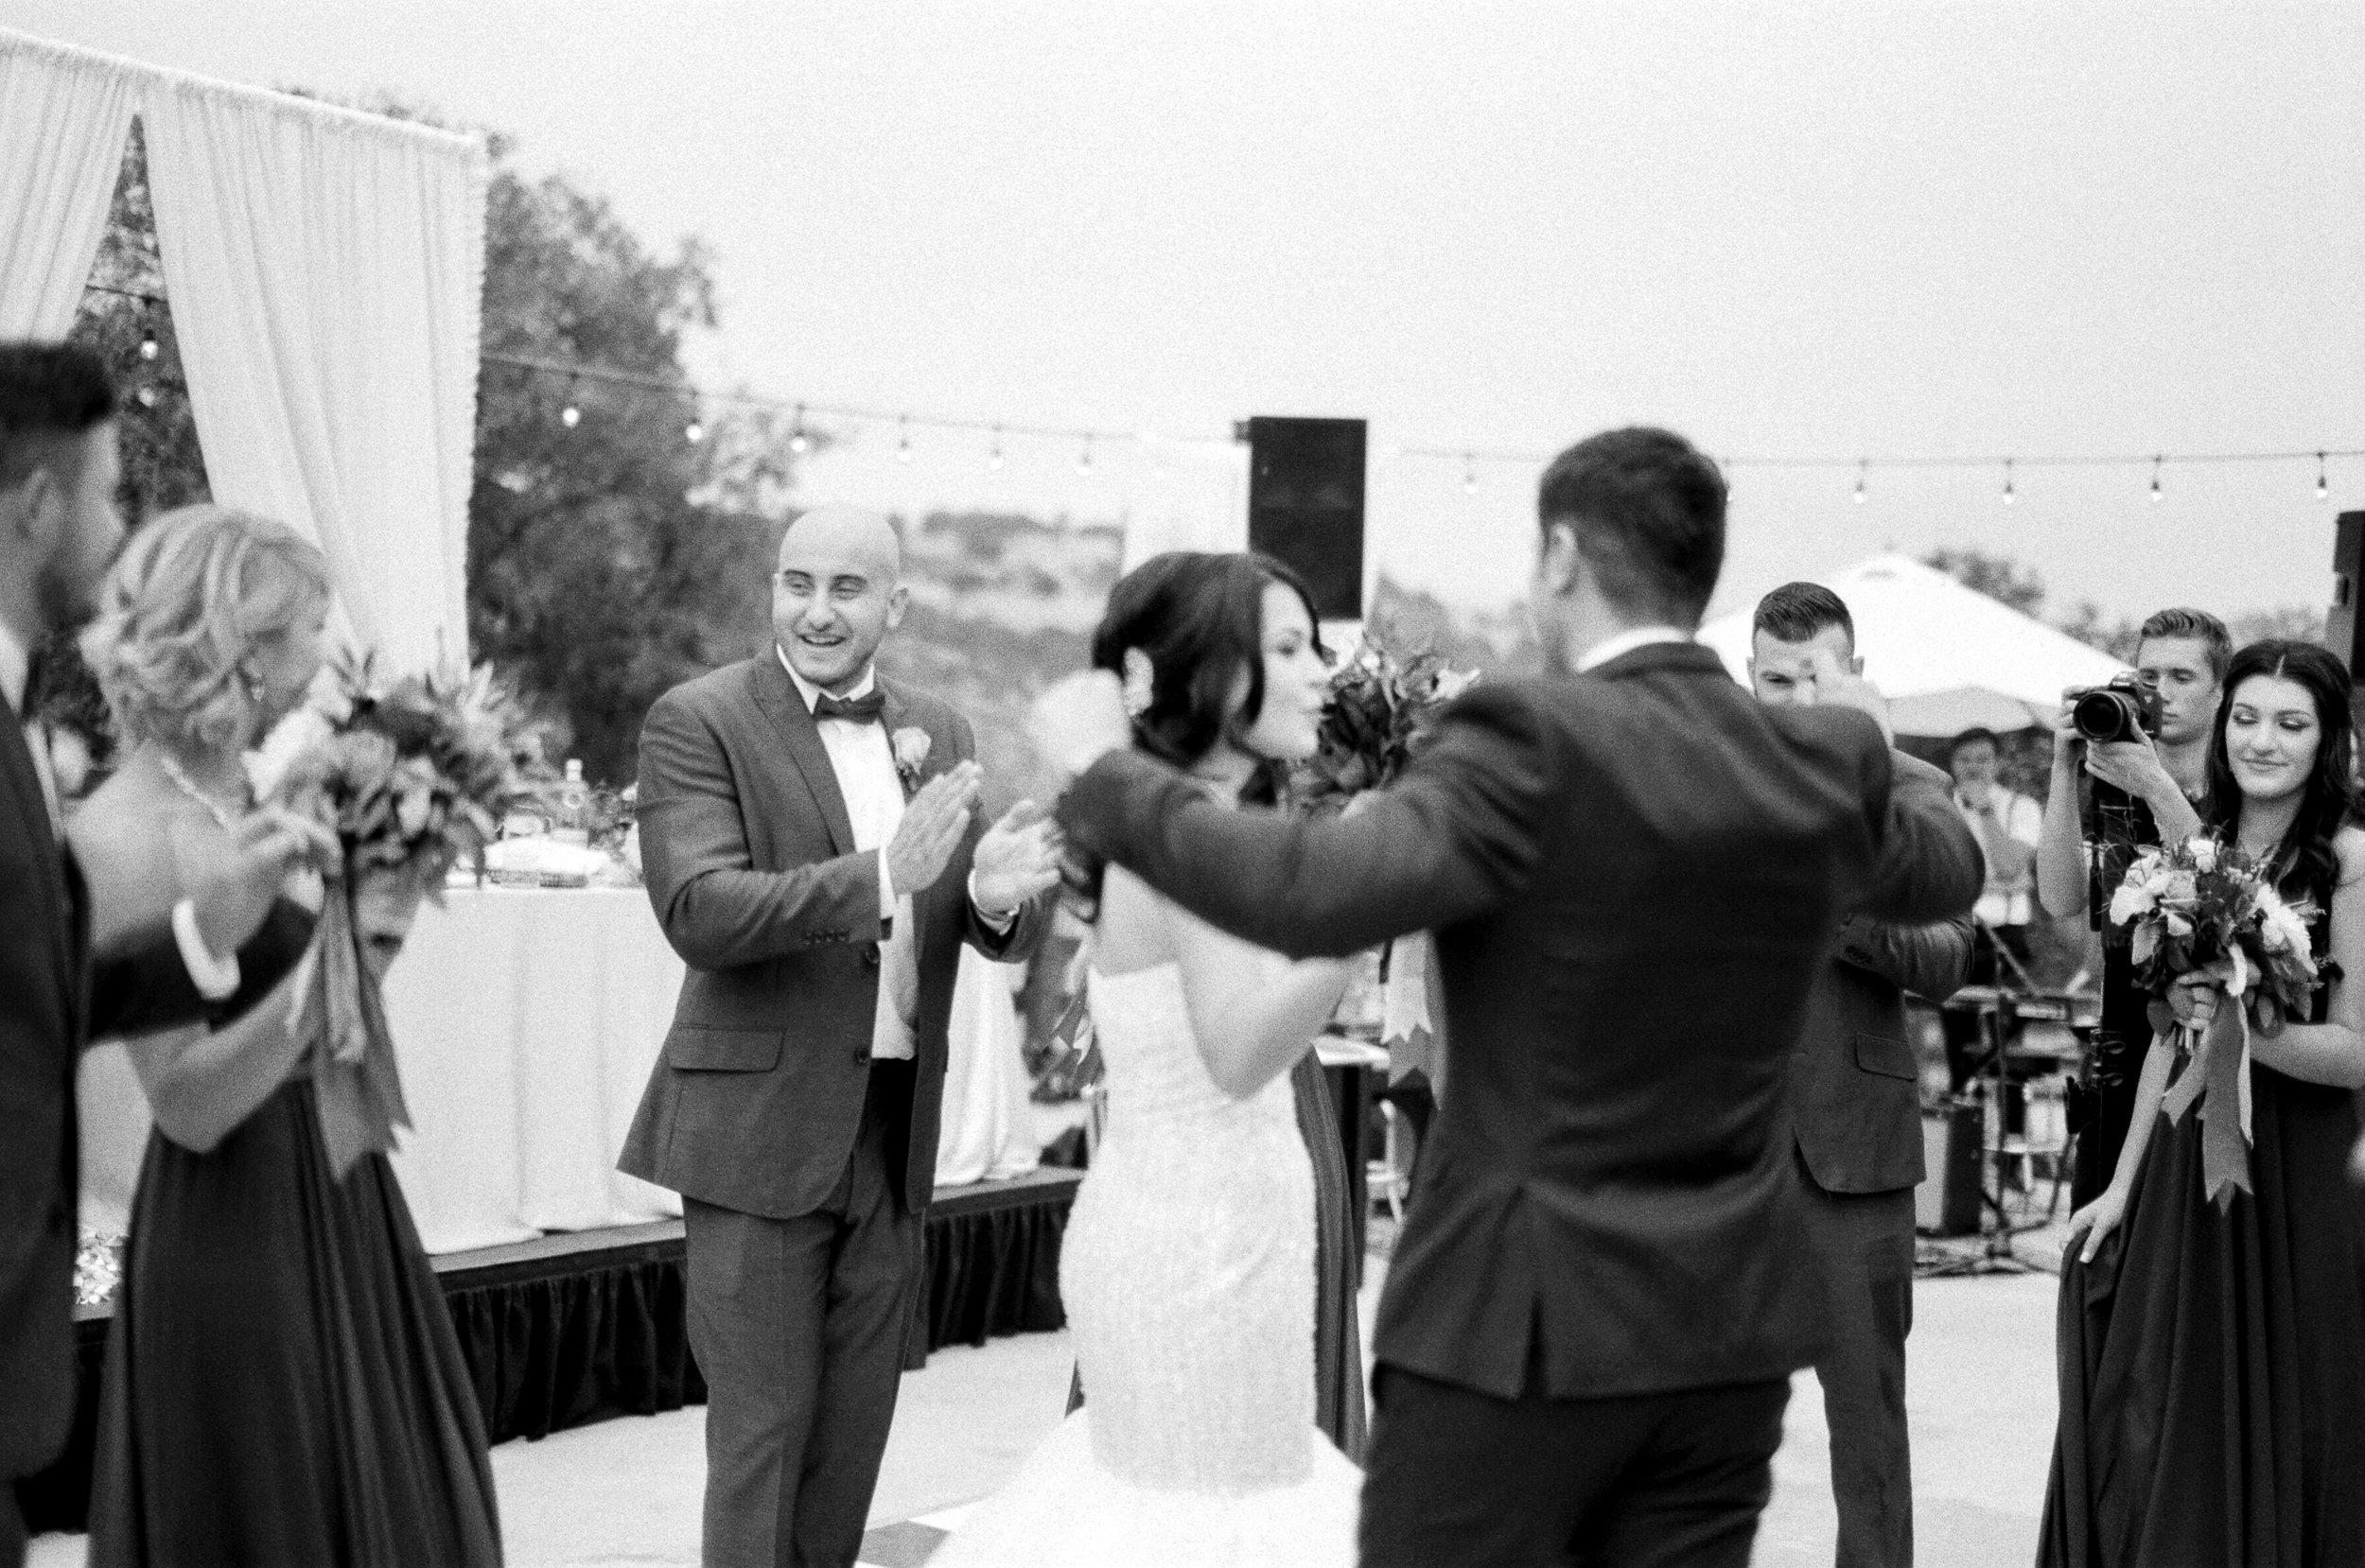 Amador_County_Wedding_Reception_Dancing_Black_White_Rancho_Victoria_Vineyard_Northern_California.jpg